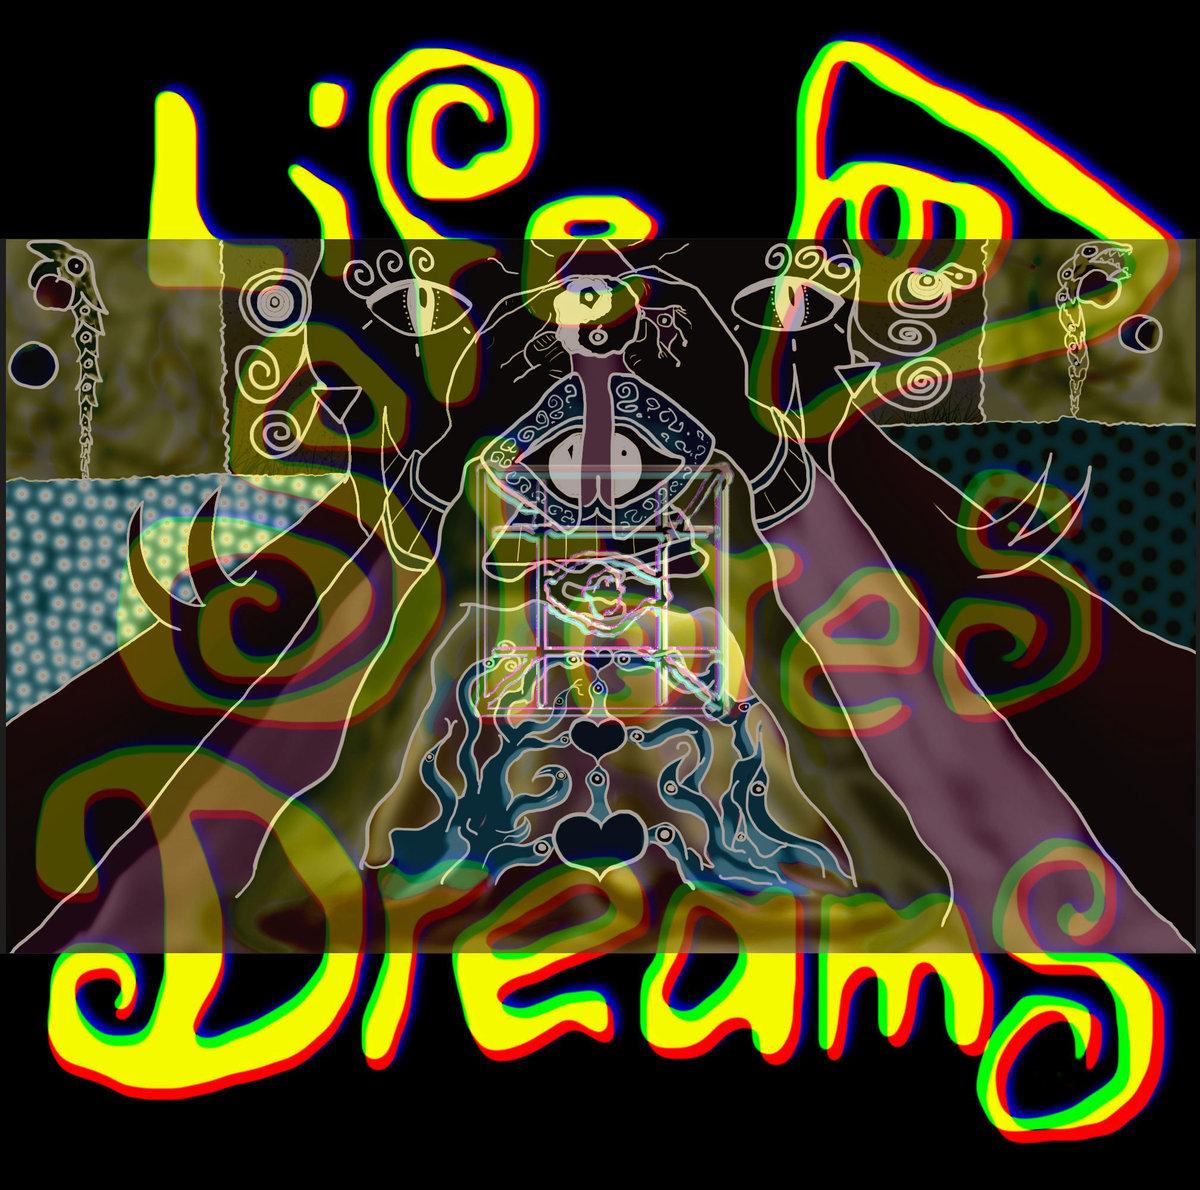 Amecylia - Life Stores Dreams